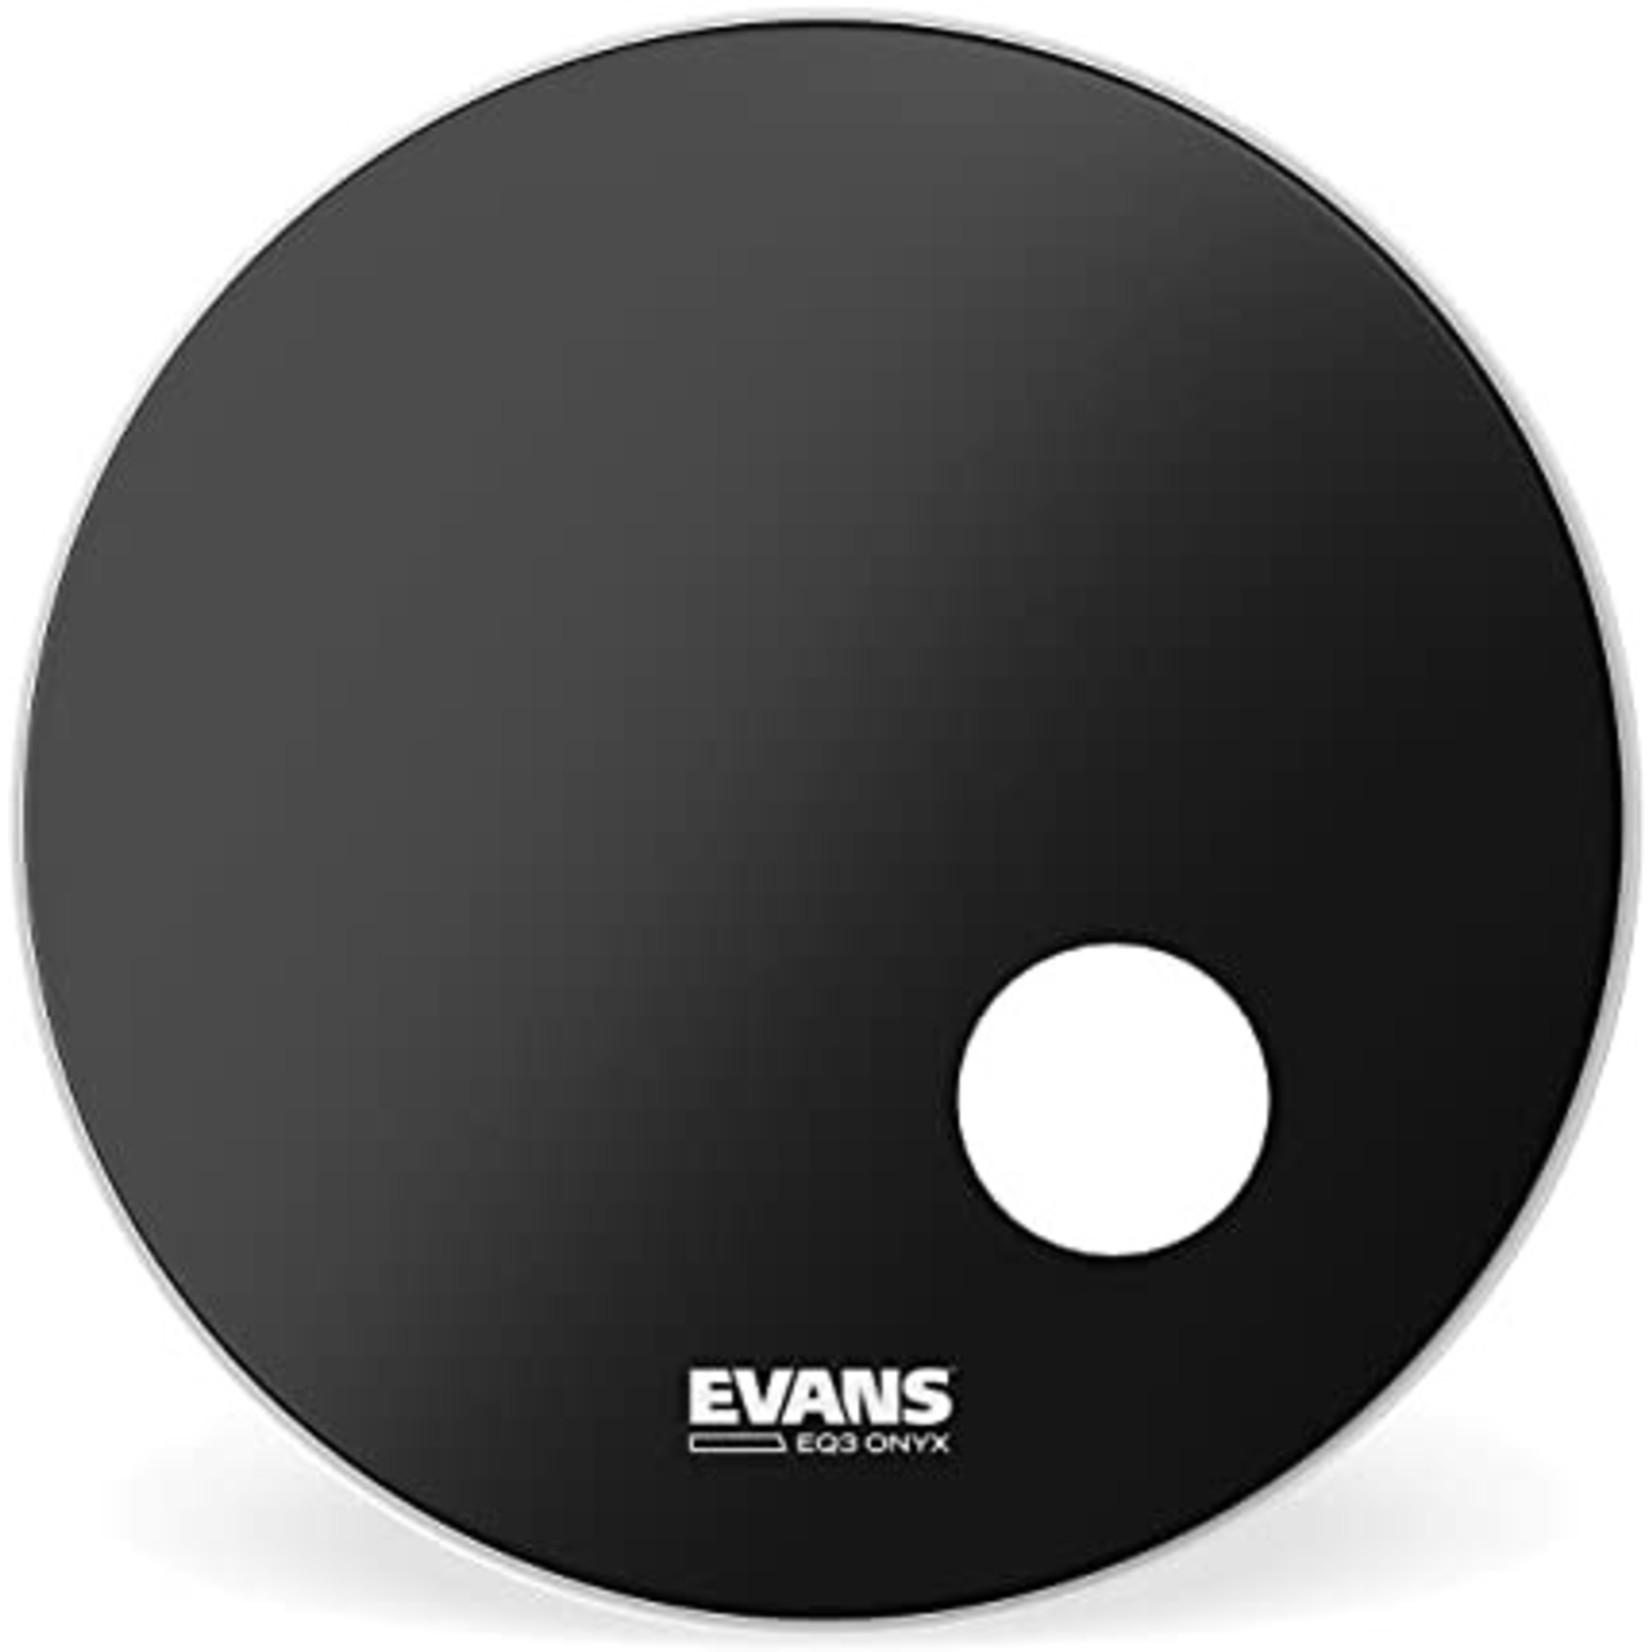 Evans Evans Onyx Bass Drum Reso